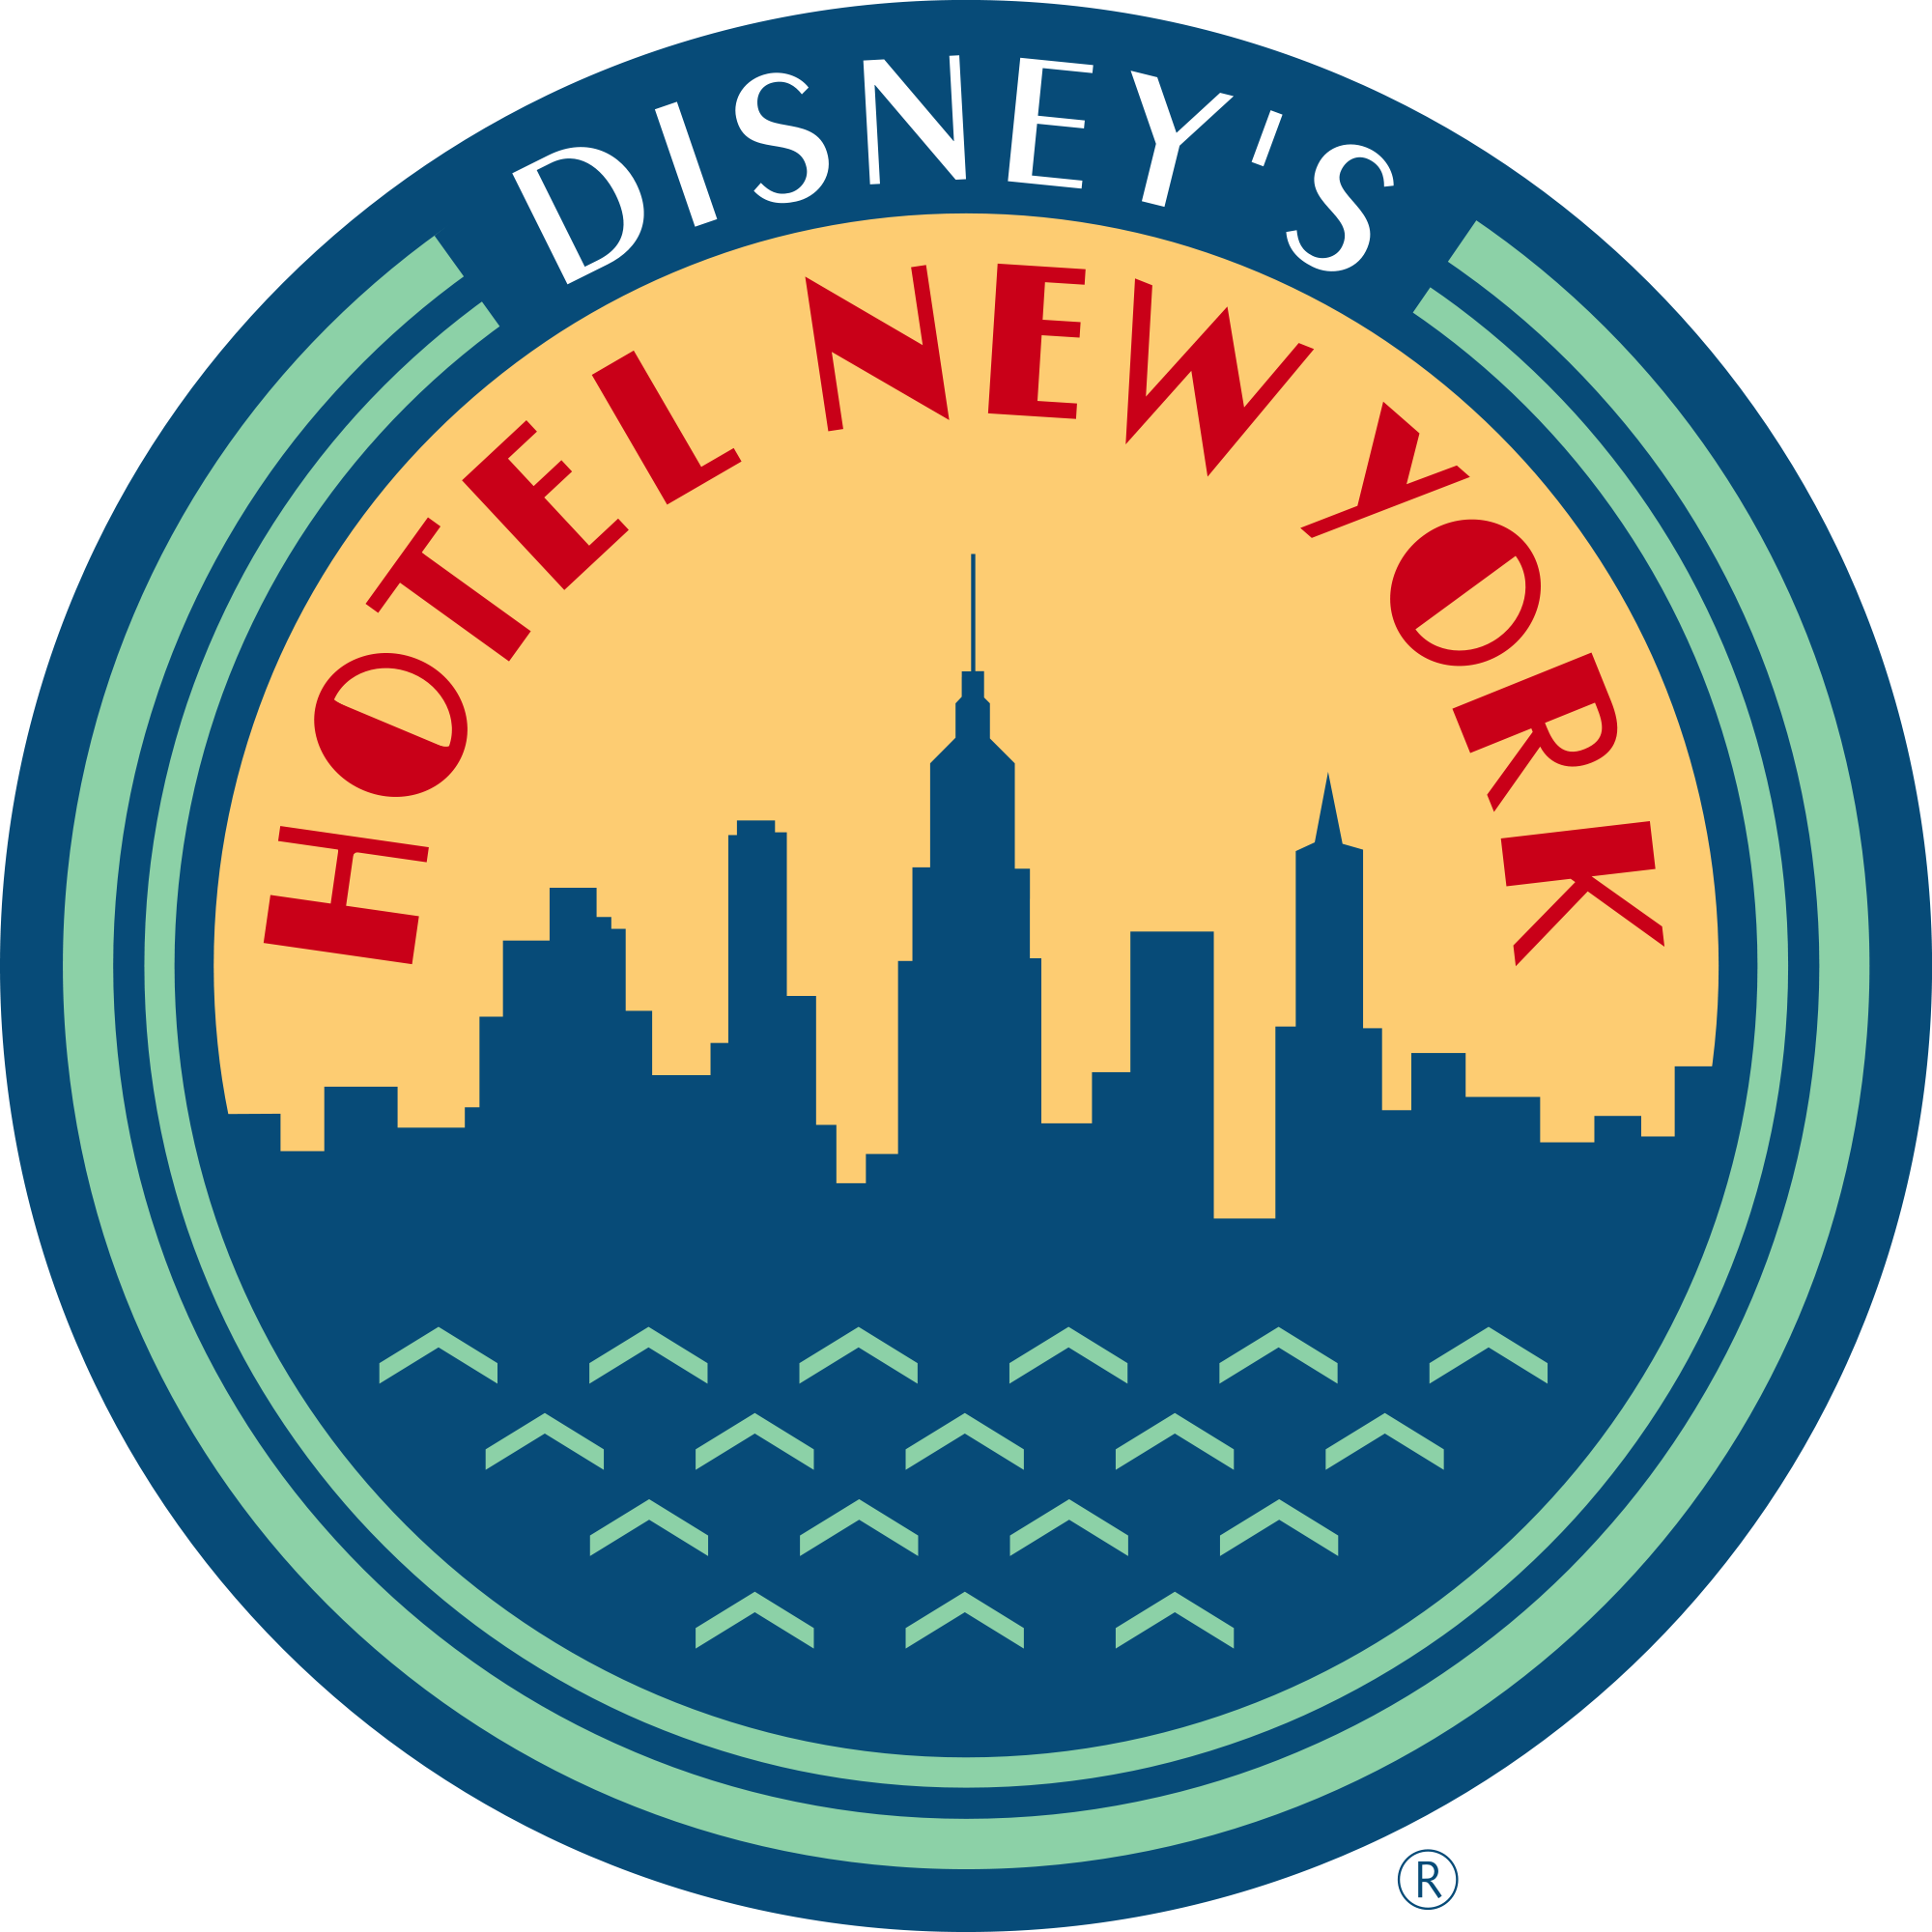 Disneyland clipart vacation disney. S hotel new york